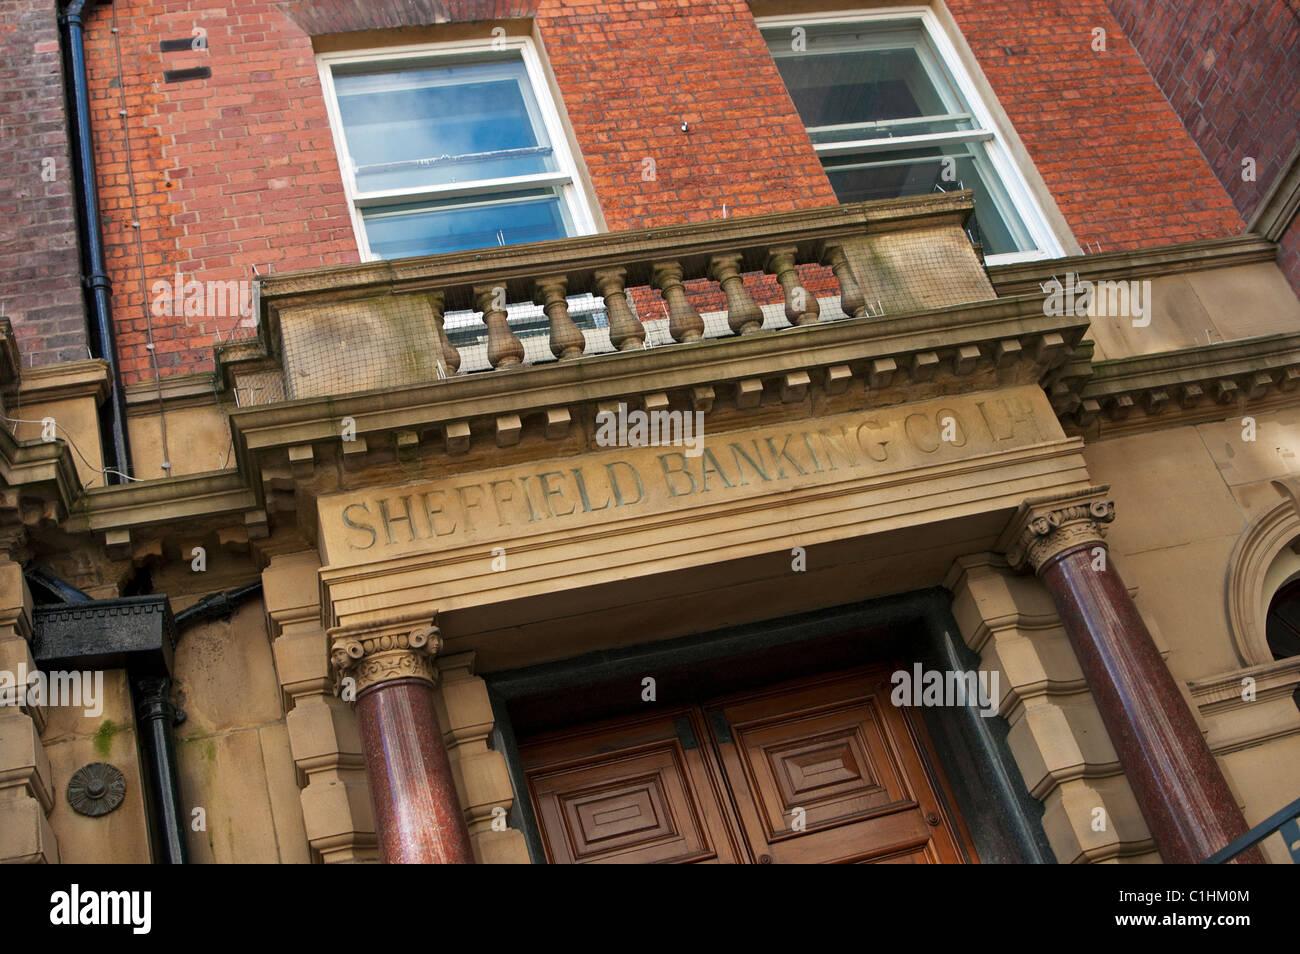 Sheffield Banking Company Ltd. building - Stock Image